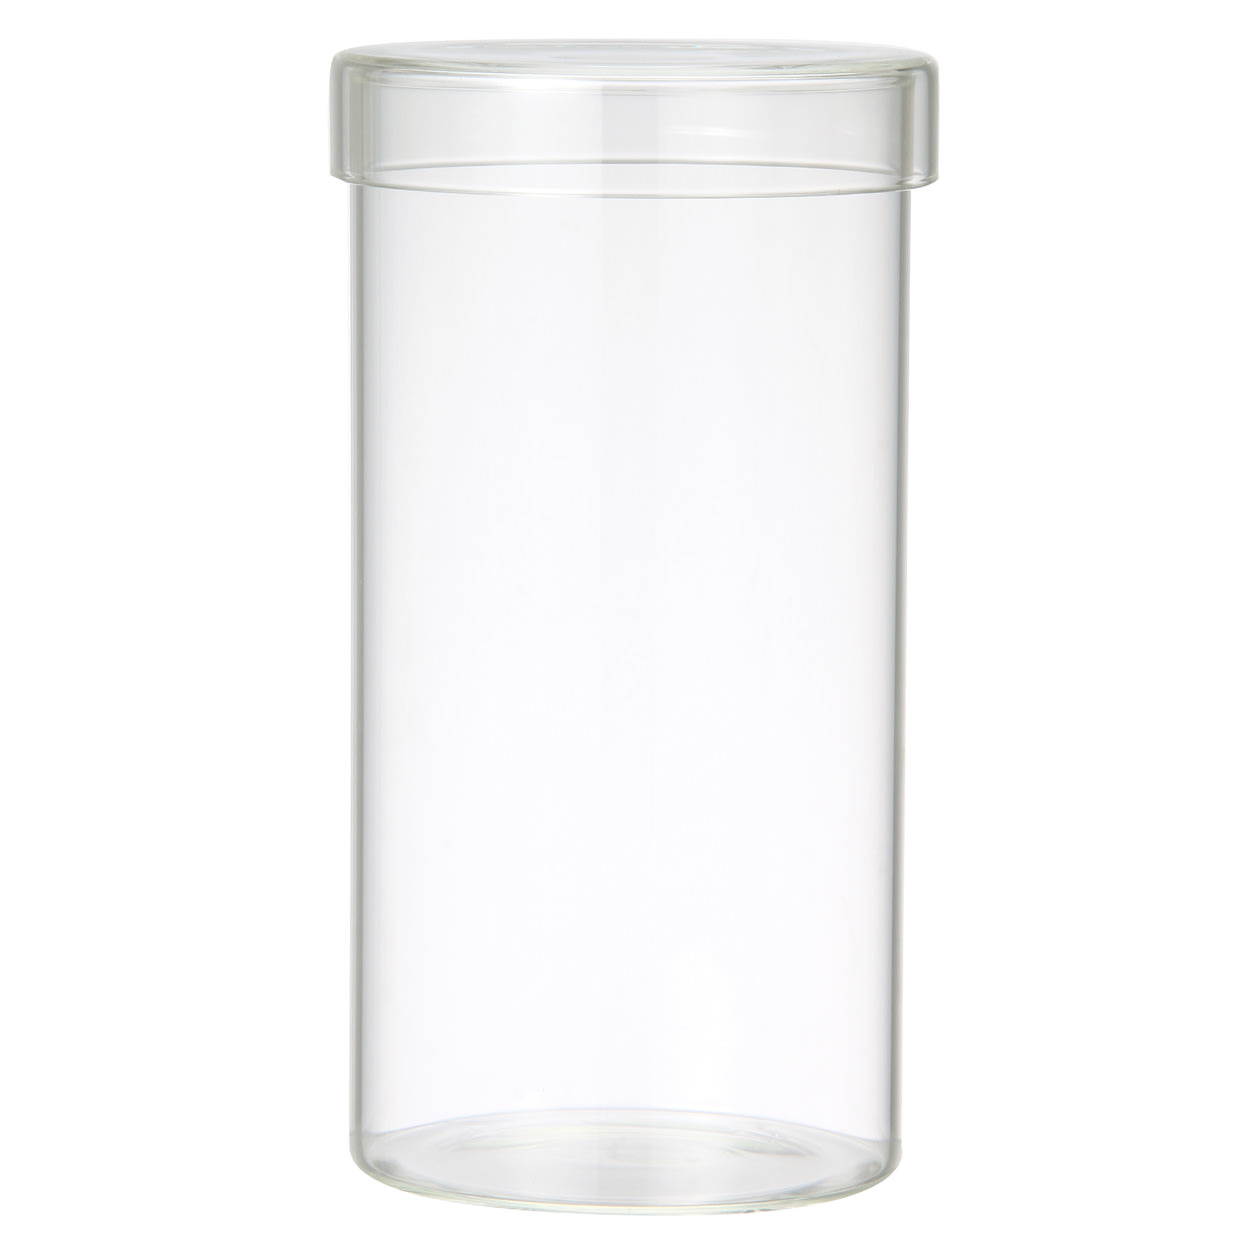 RoomClip商品情報 - ガラス小物容器・大